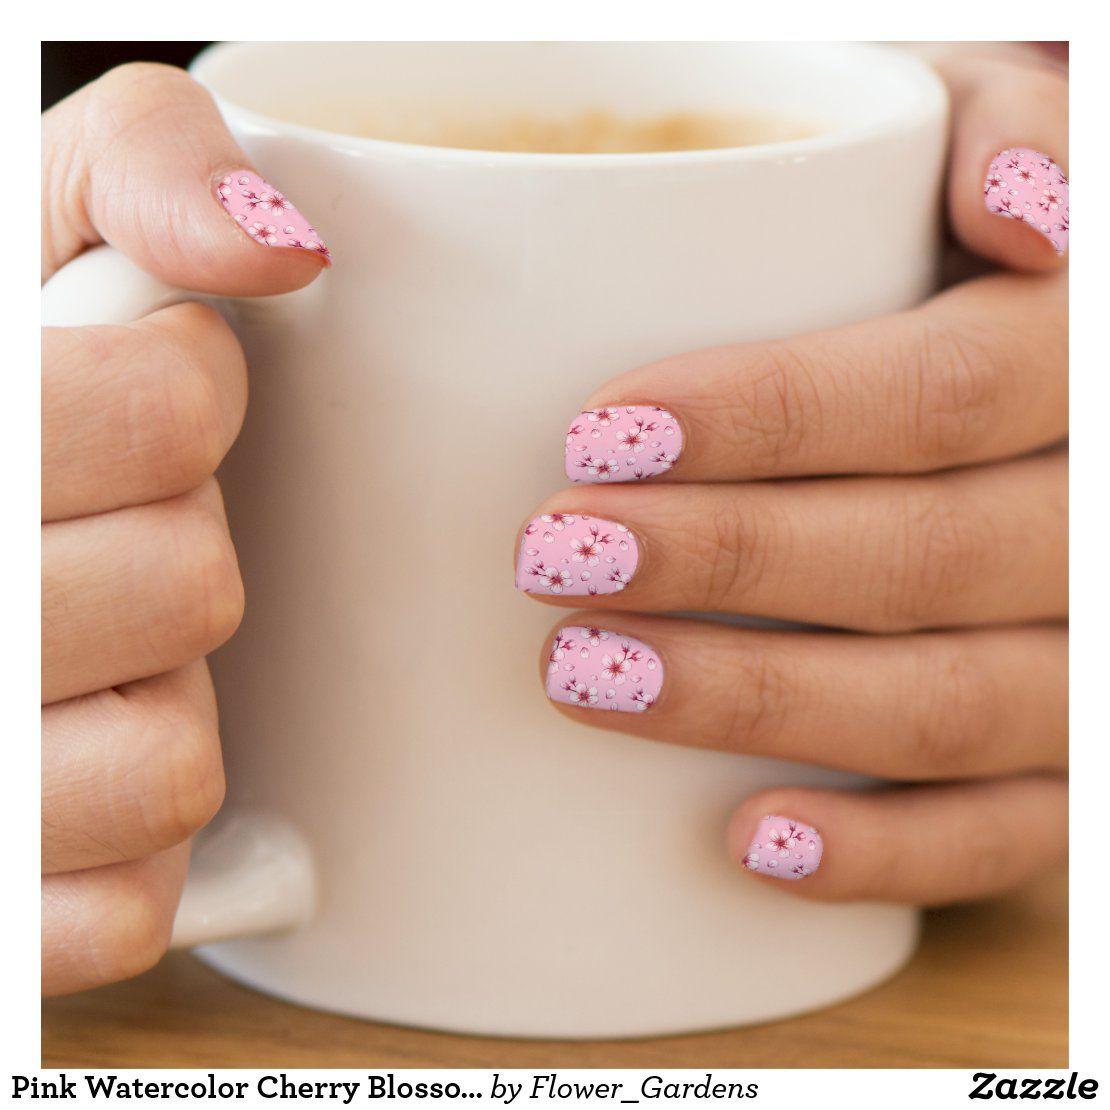 Pink Watercolor Cherry Blossom Pattern Minx Nail Art | Zazzle.com